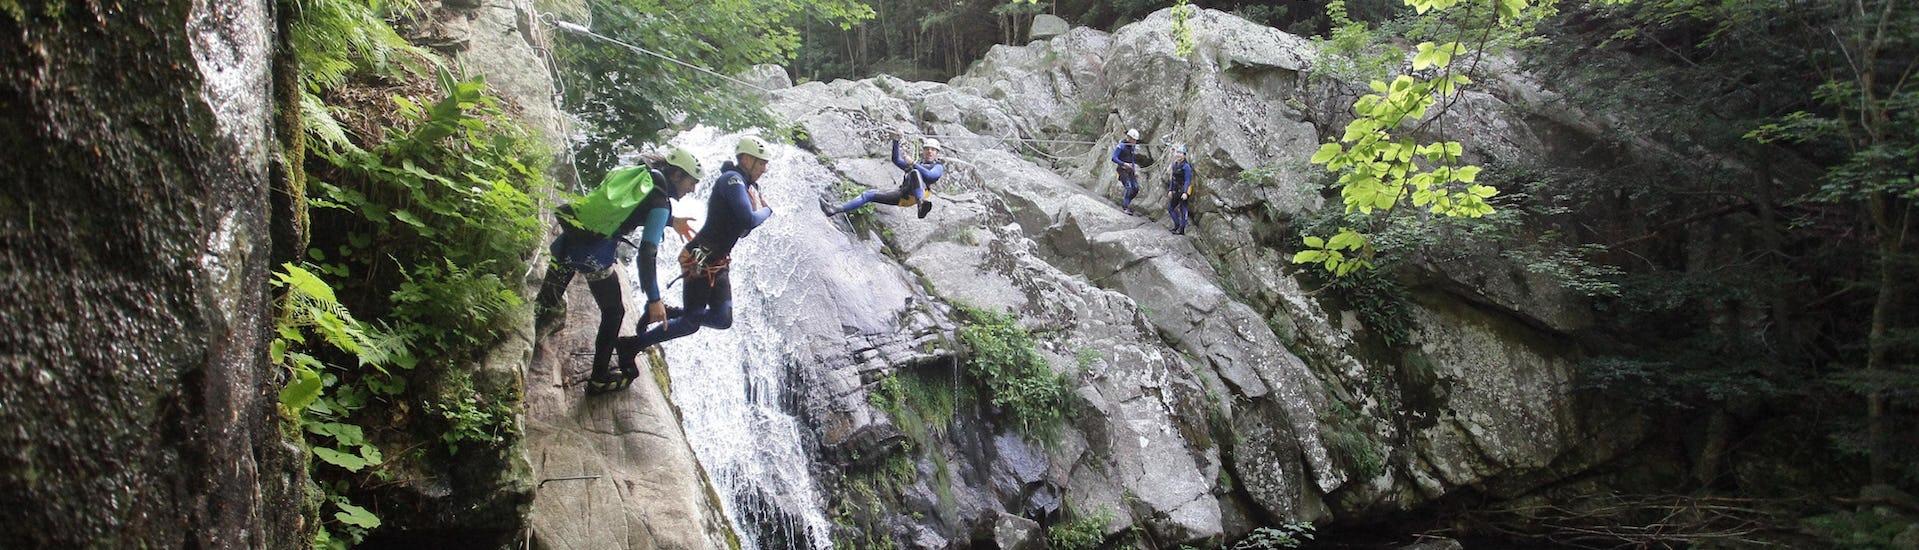 canyoning-classic-aero-besorgues-geo-canyon-hero1